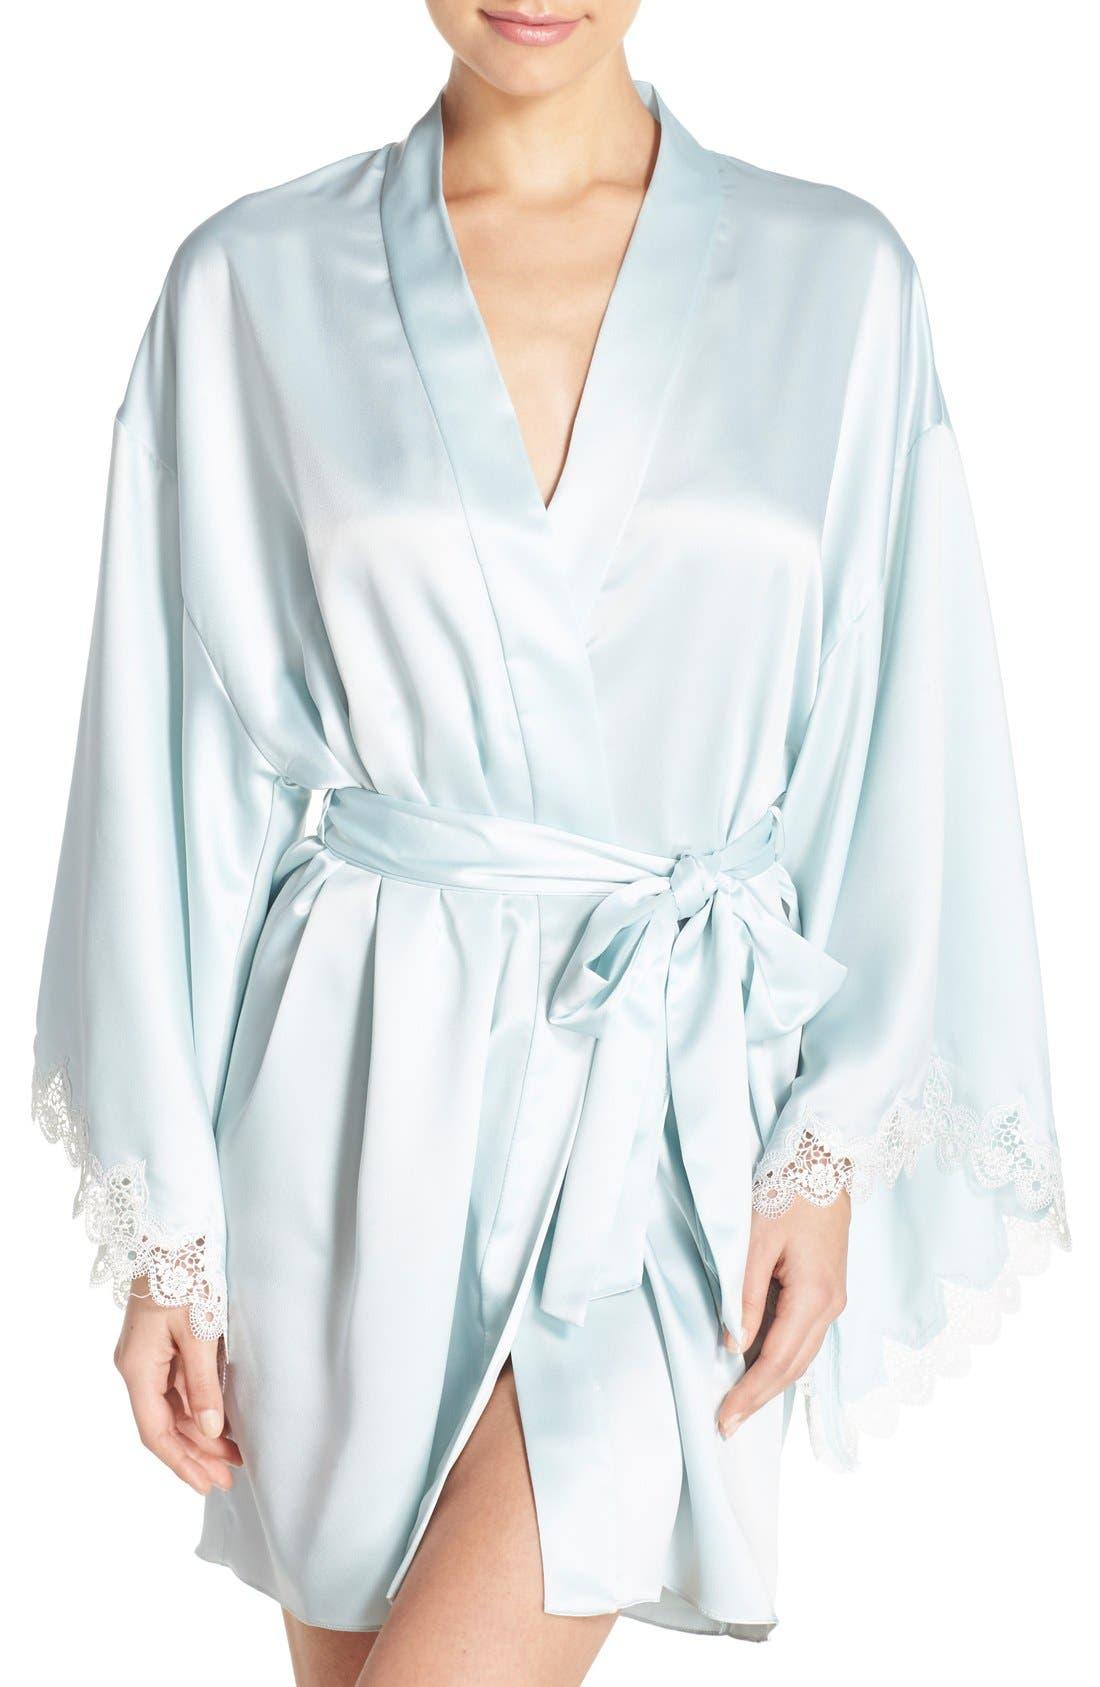 Alternate Image 1 Selected - Flora Nikrooz 'Dahlia' Charmeuse Robe